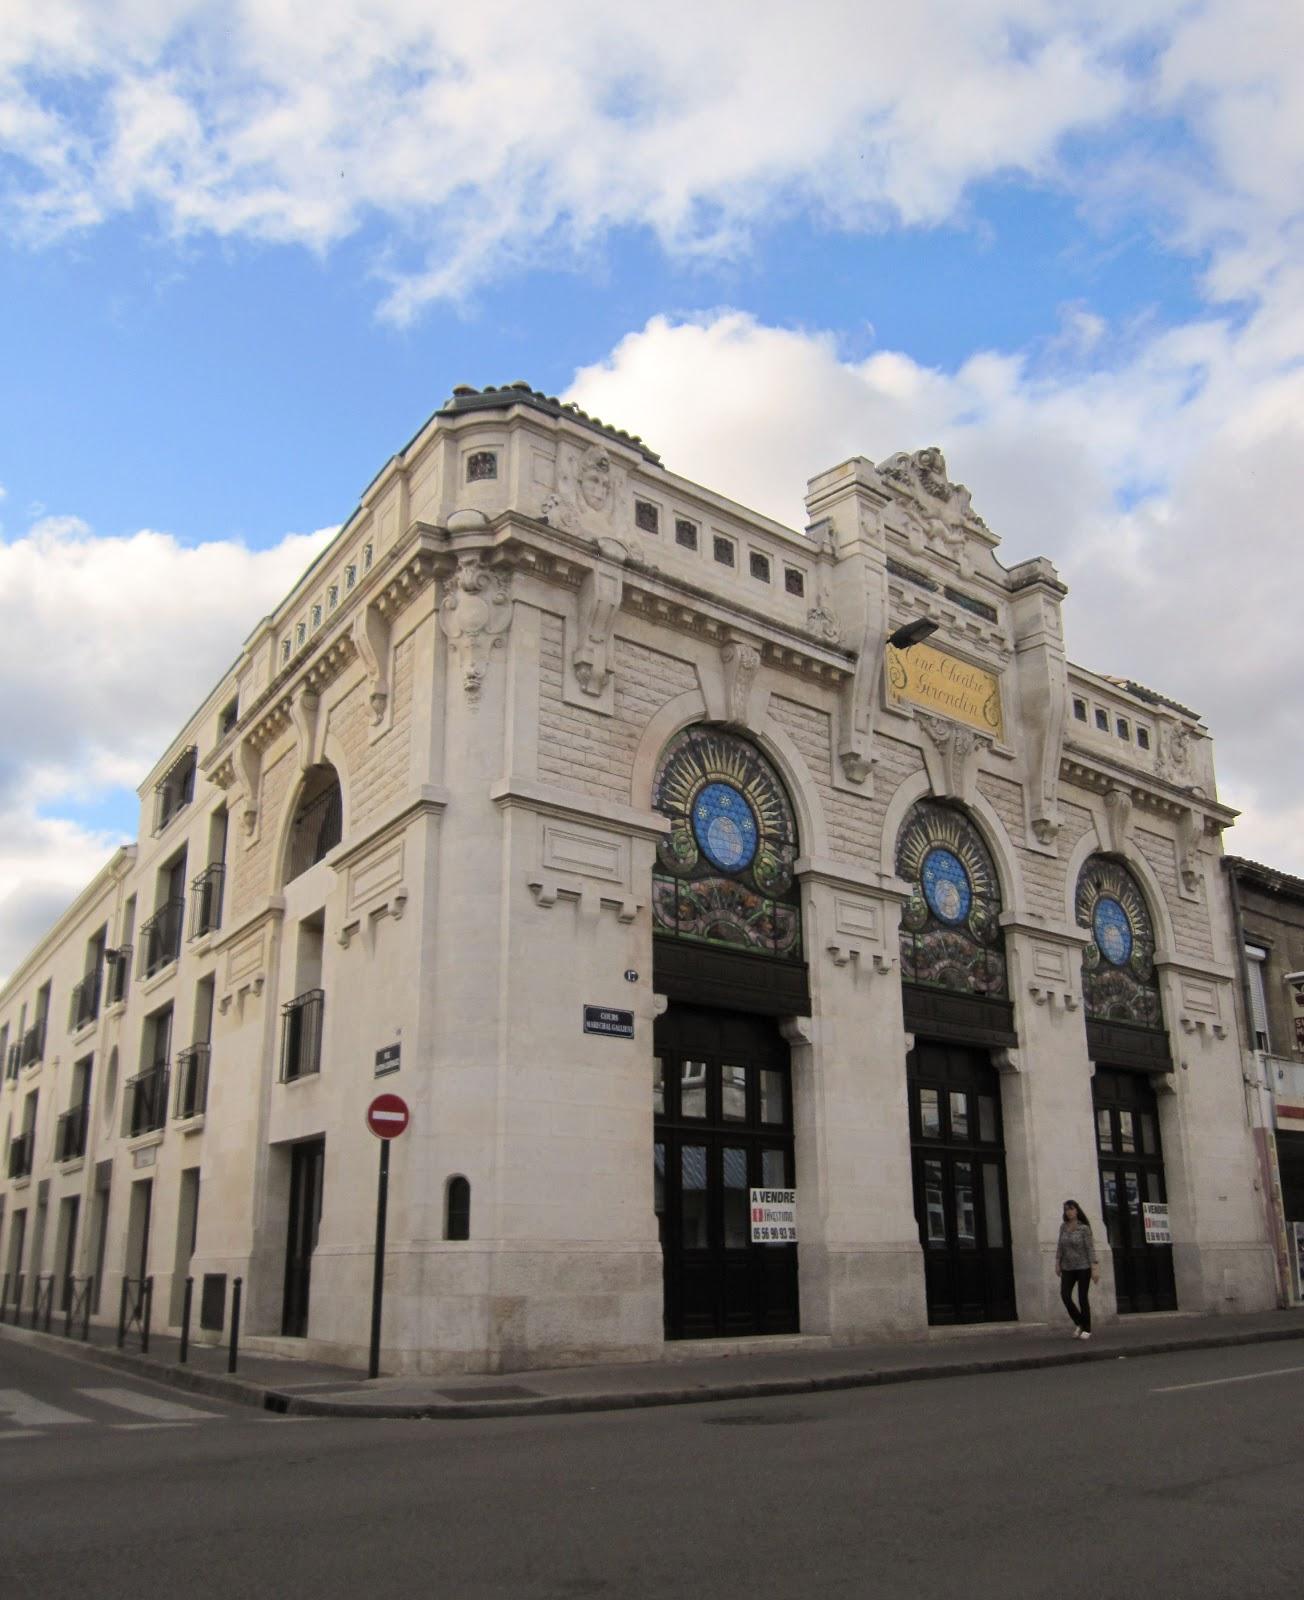 Ciné-Théâtre Girondin: the façade remains the same - Invisible Bordeaux